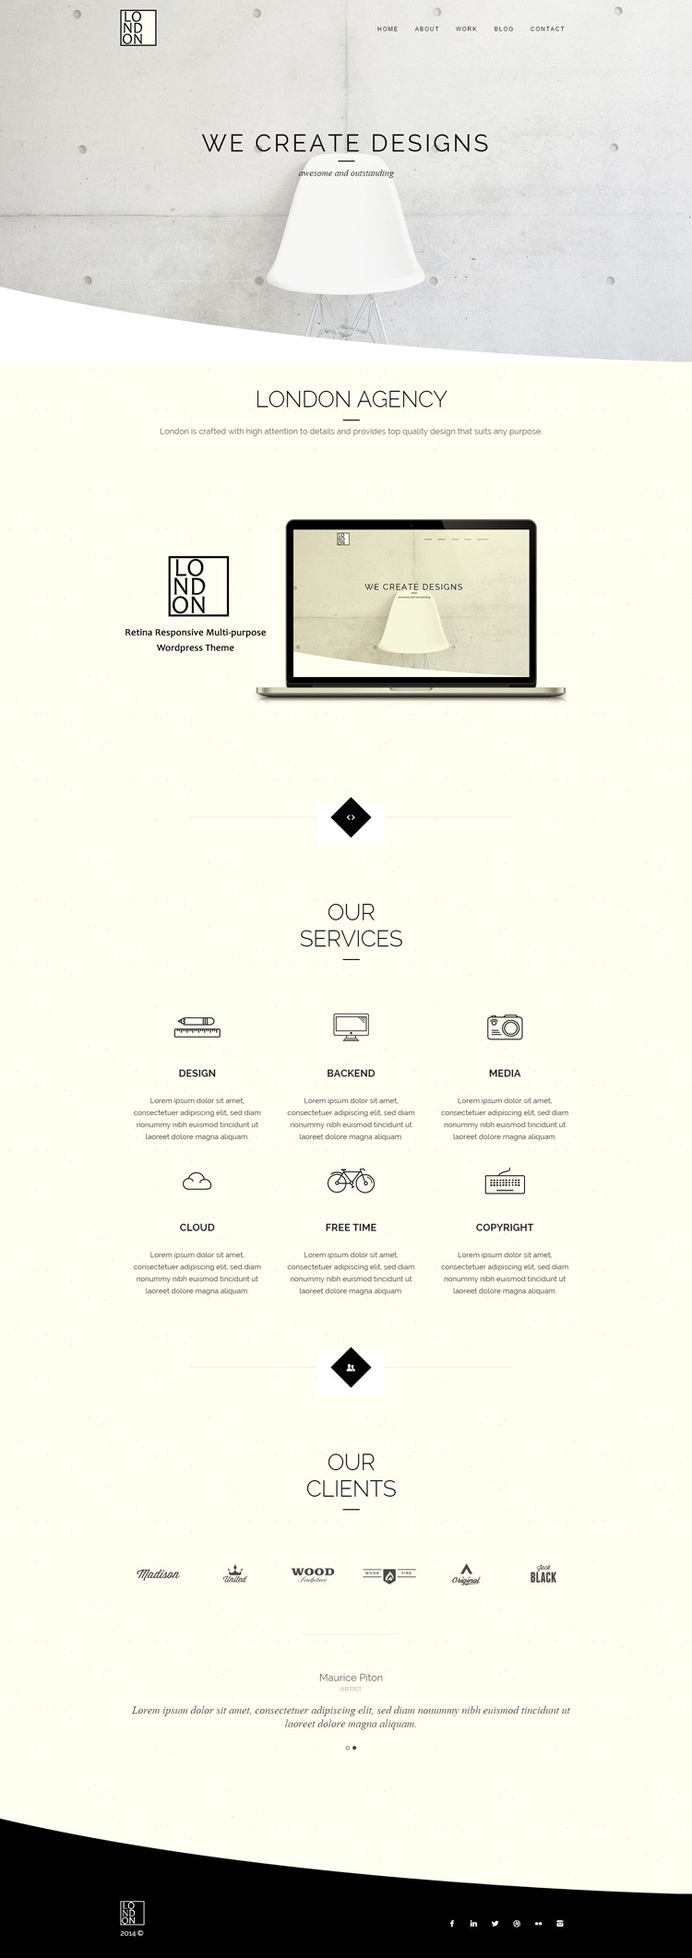 minimalist, minimal, website, concept, clean, layout #layout #clean #website #concept #minimal #minimalist